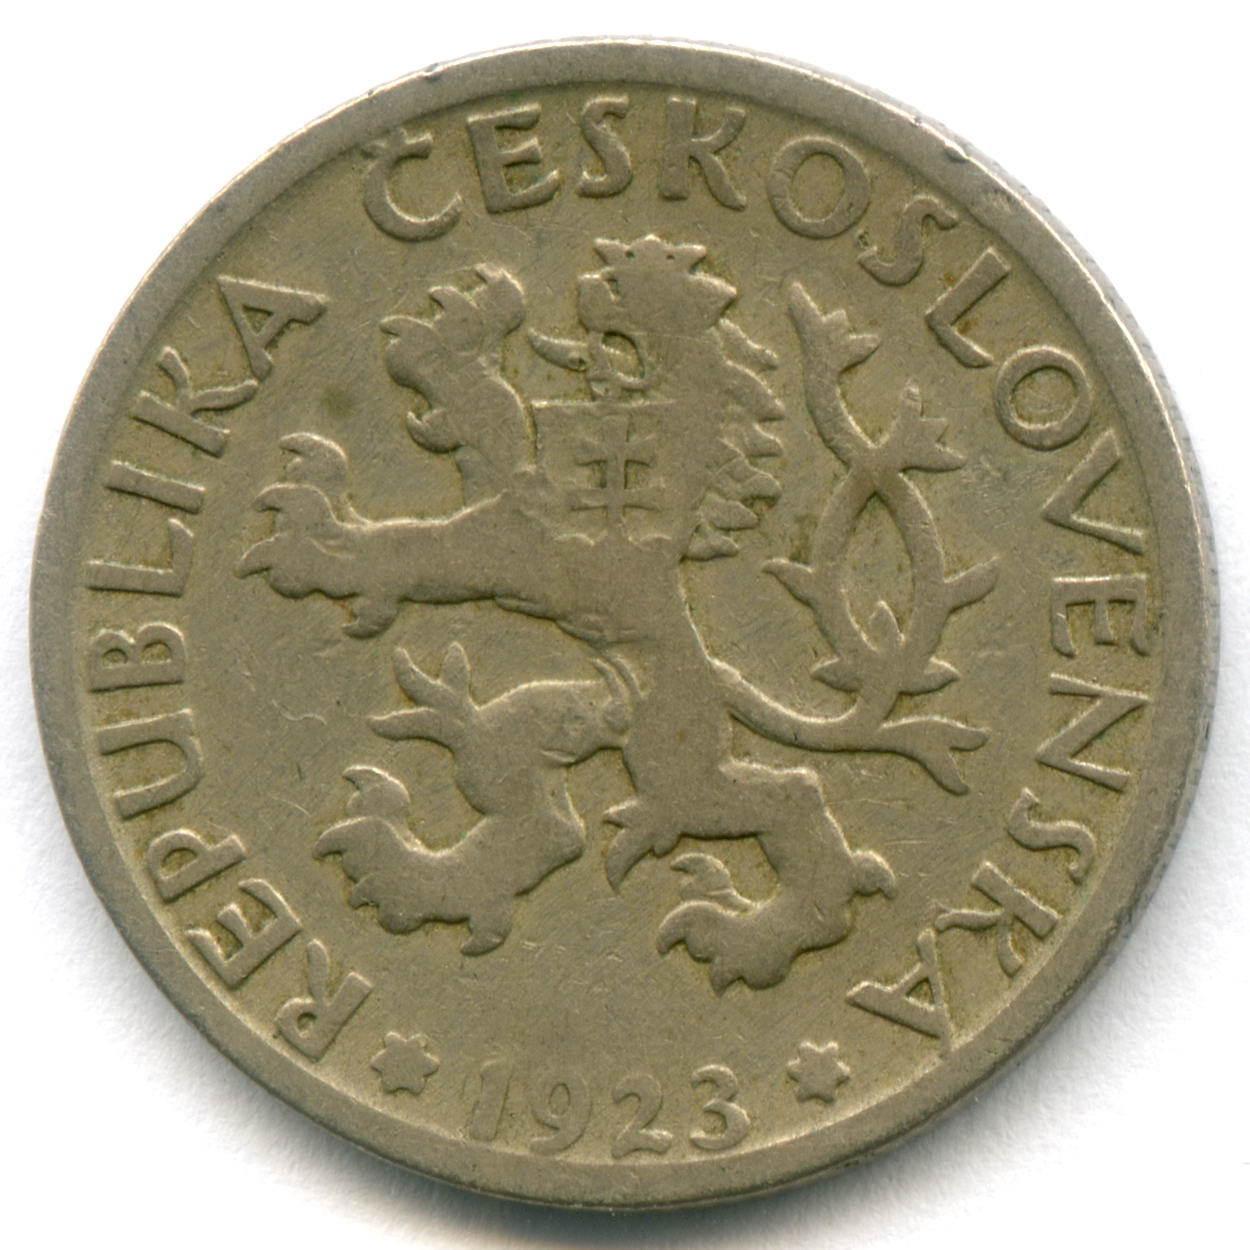 1 крона 1923 г. Чехословакия F-VF